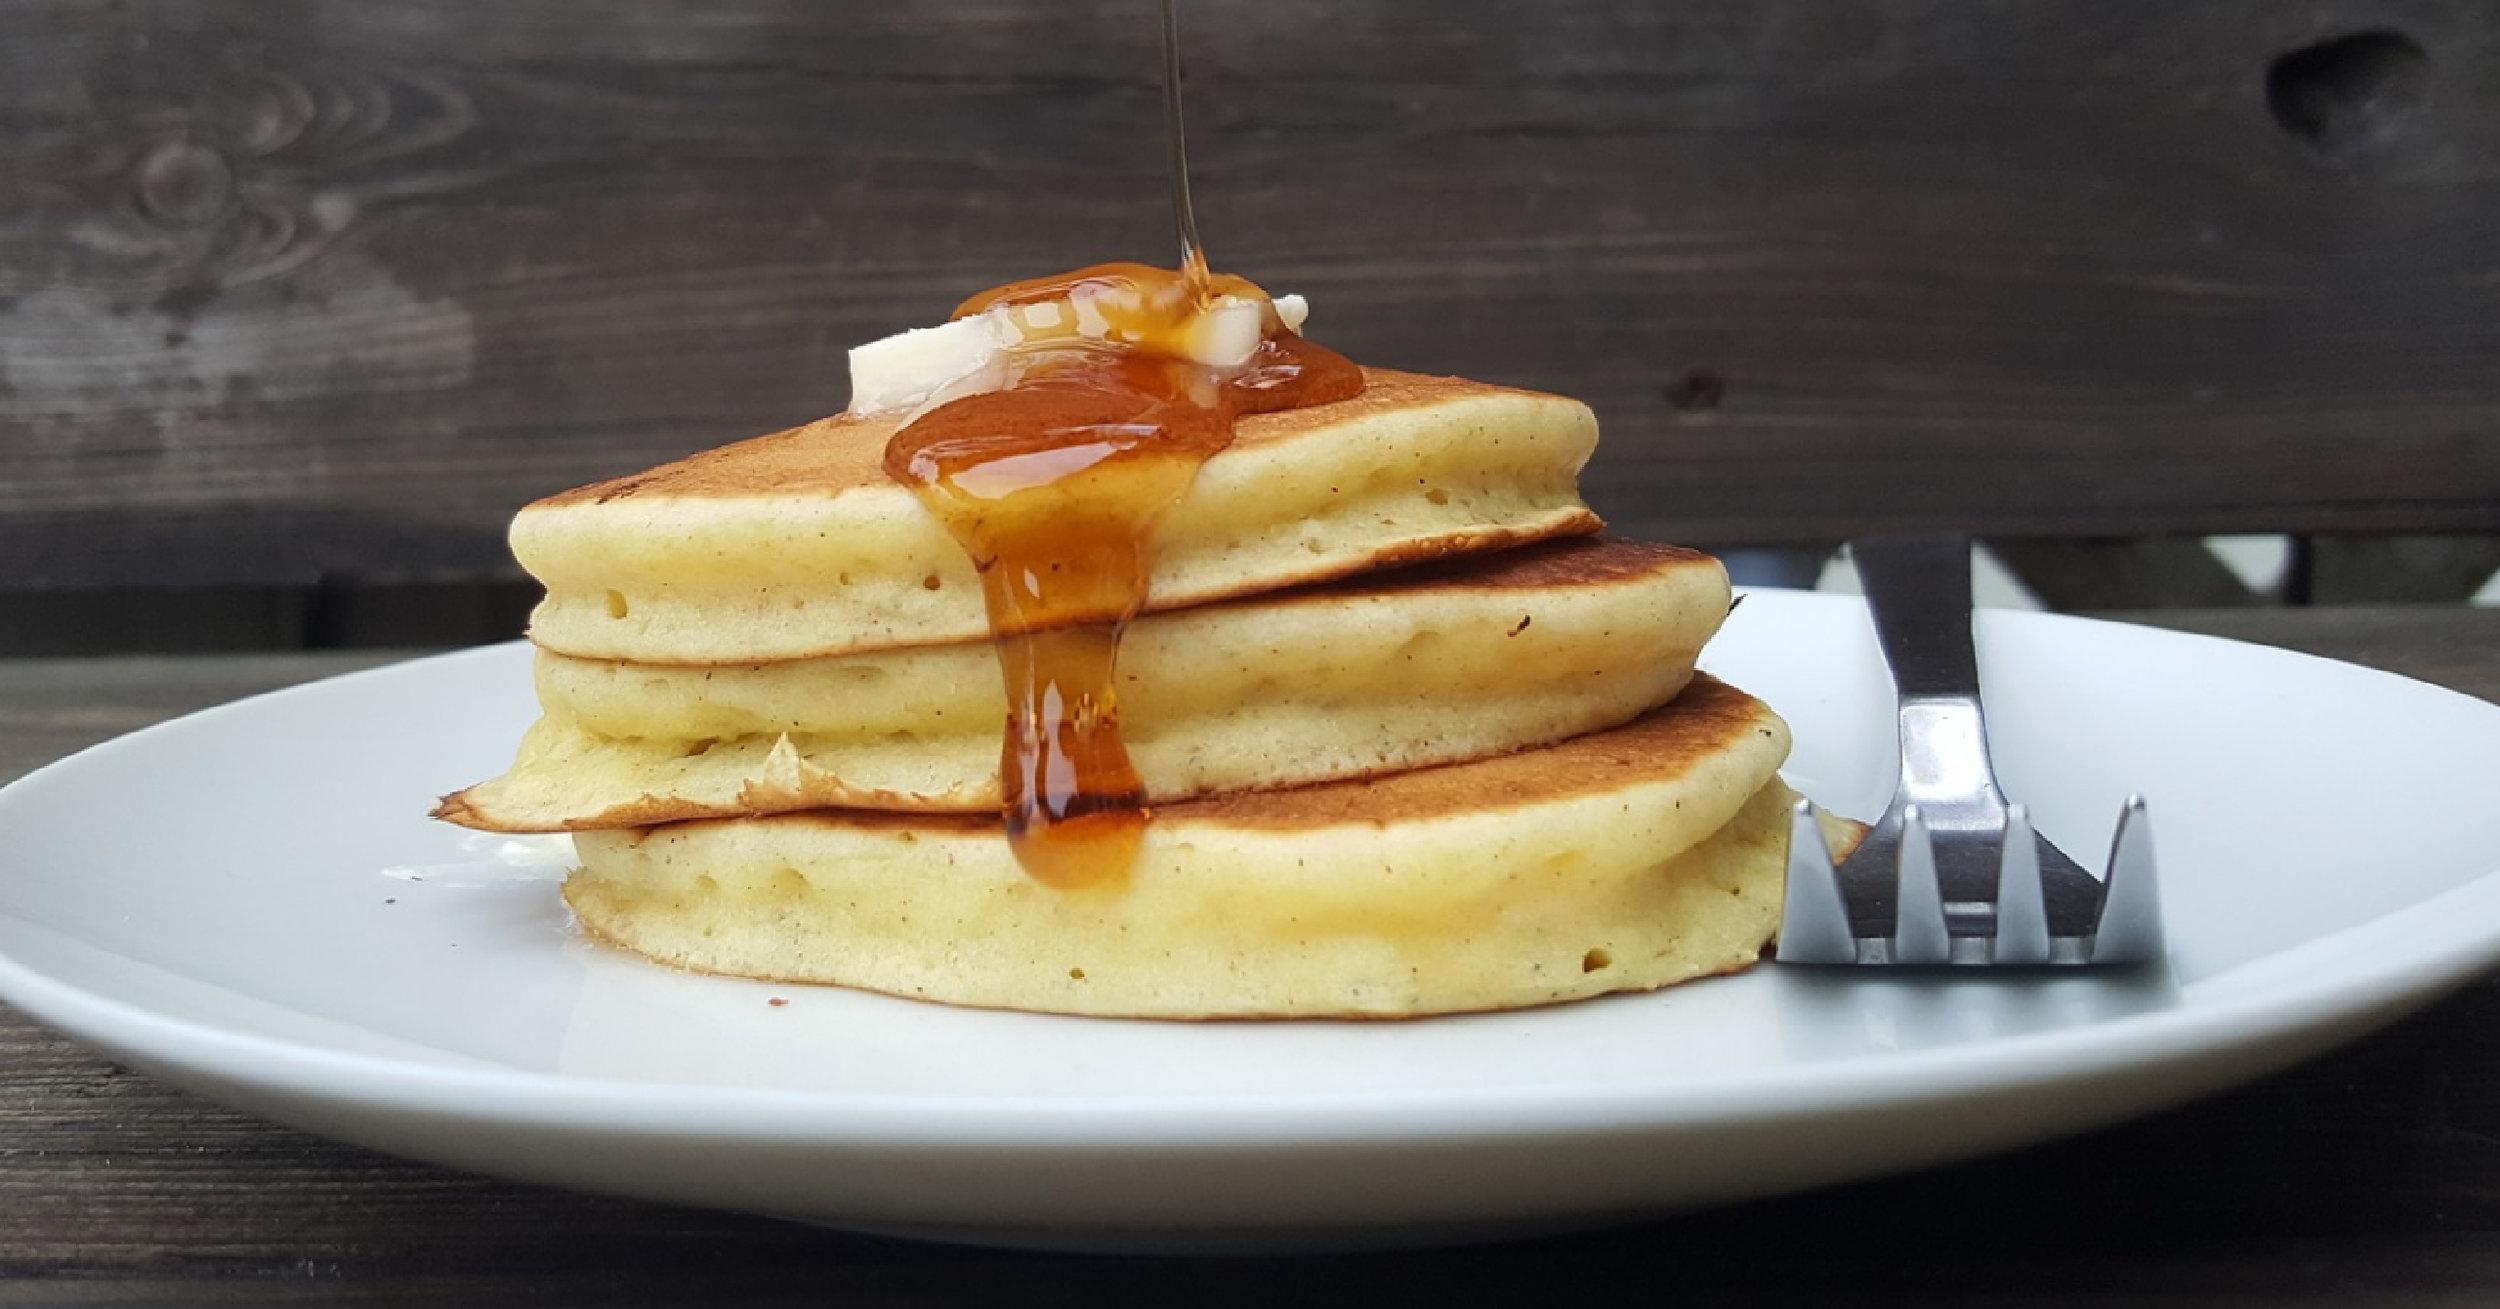 All-You-Can-Eat-Pancake-Breakfast.jpg